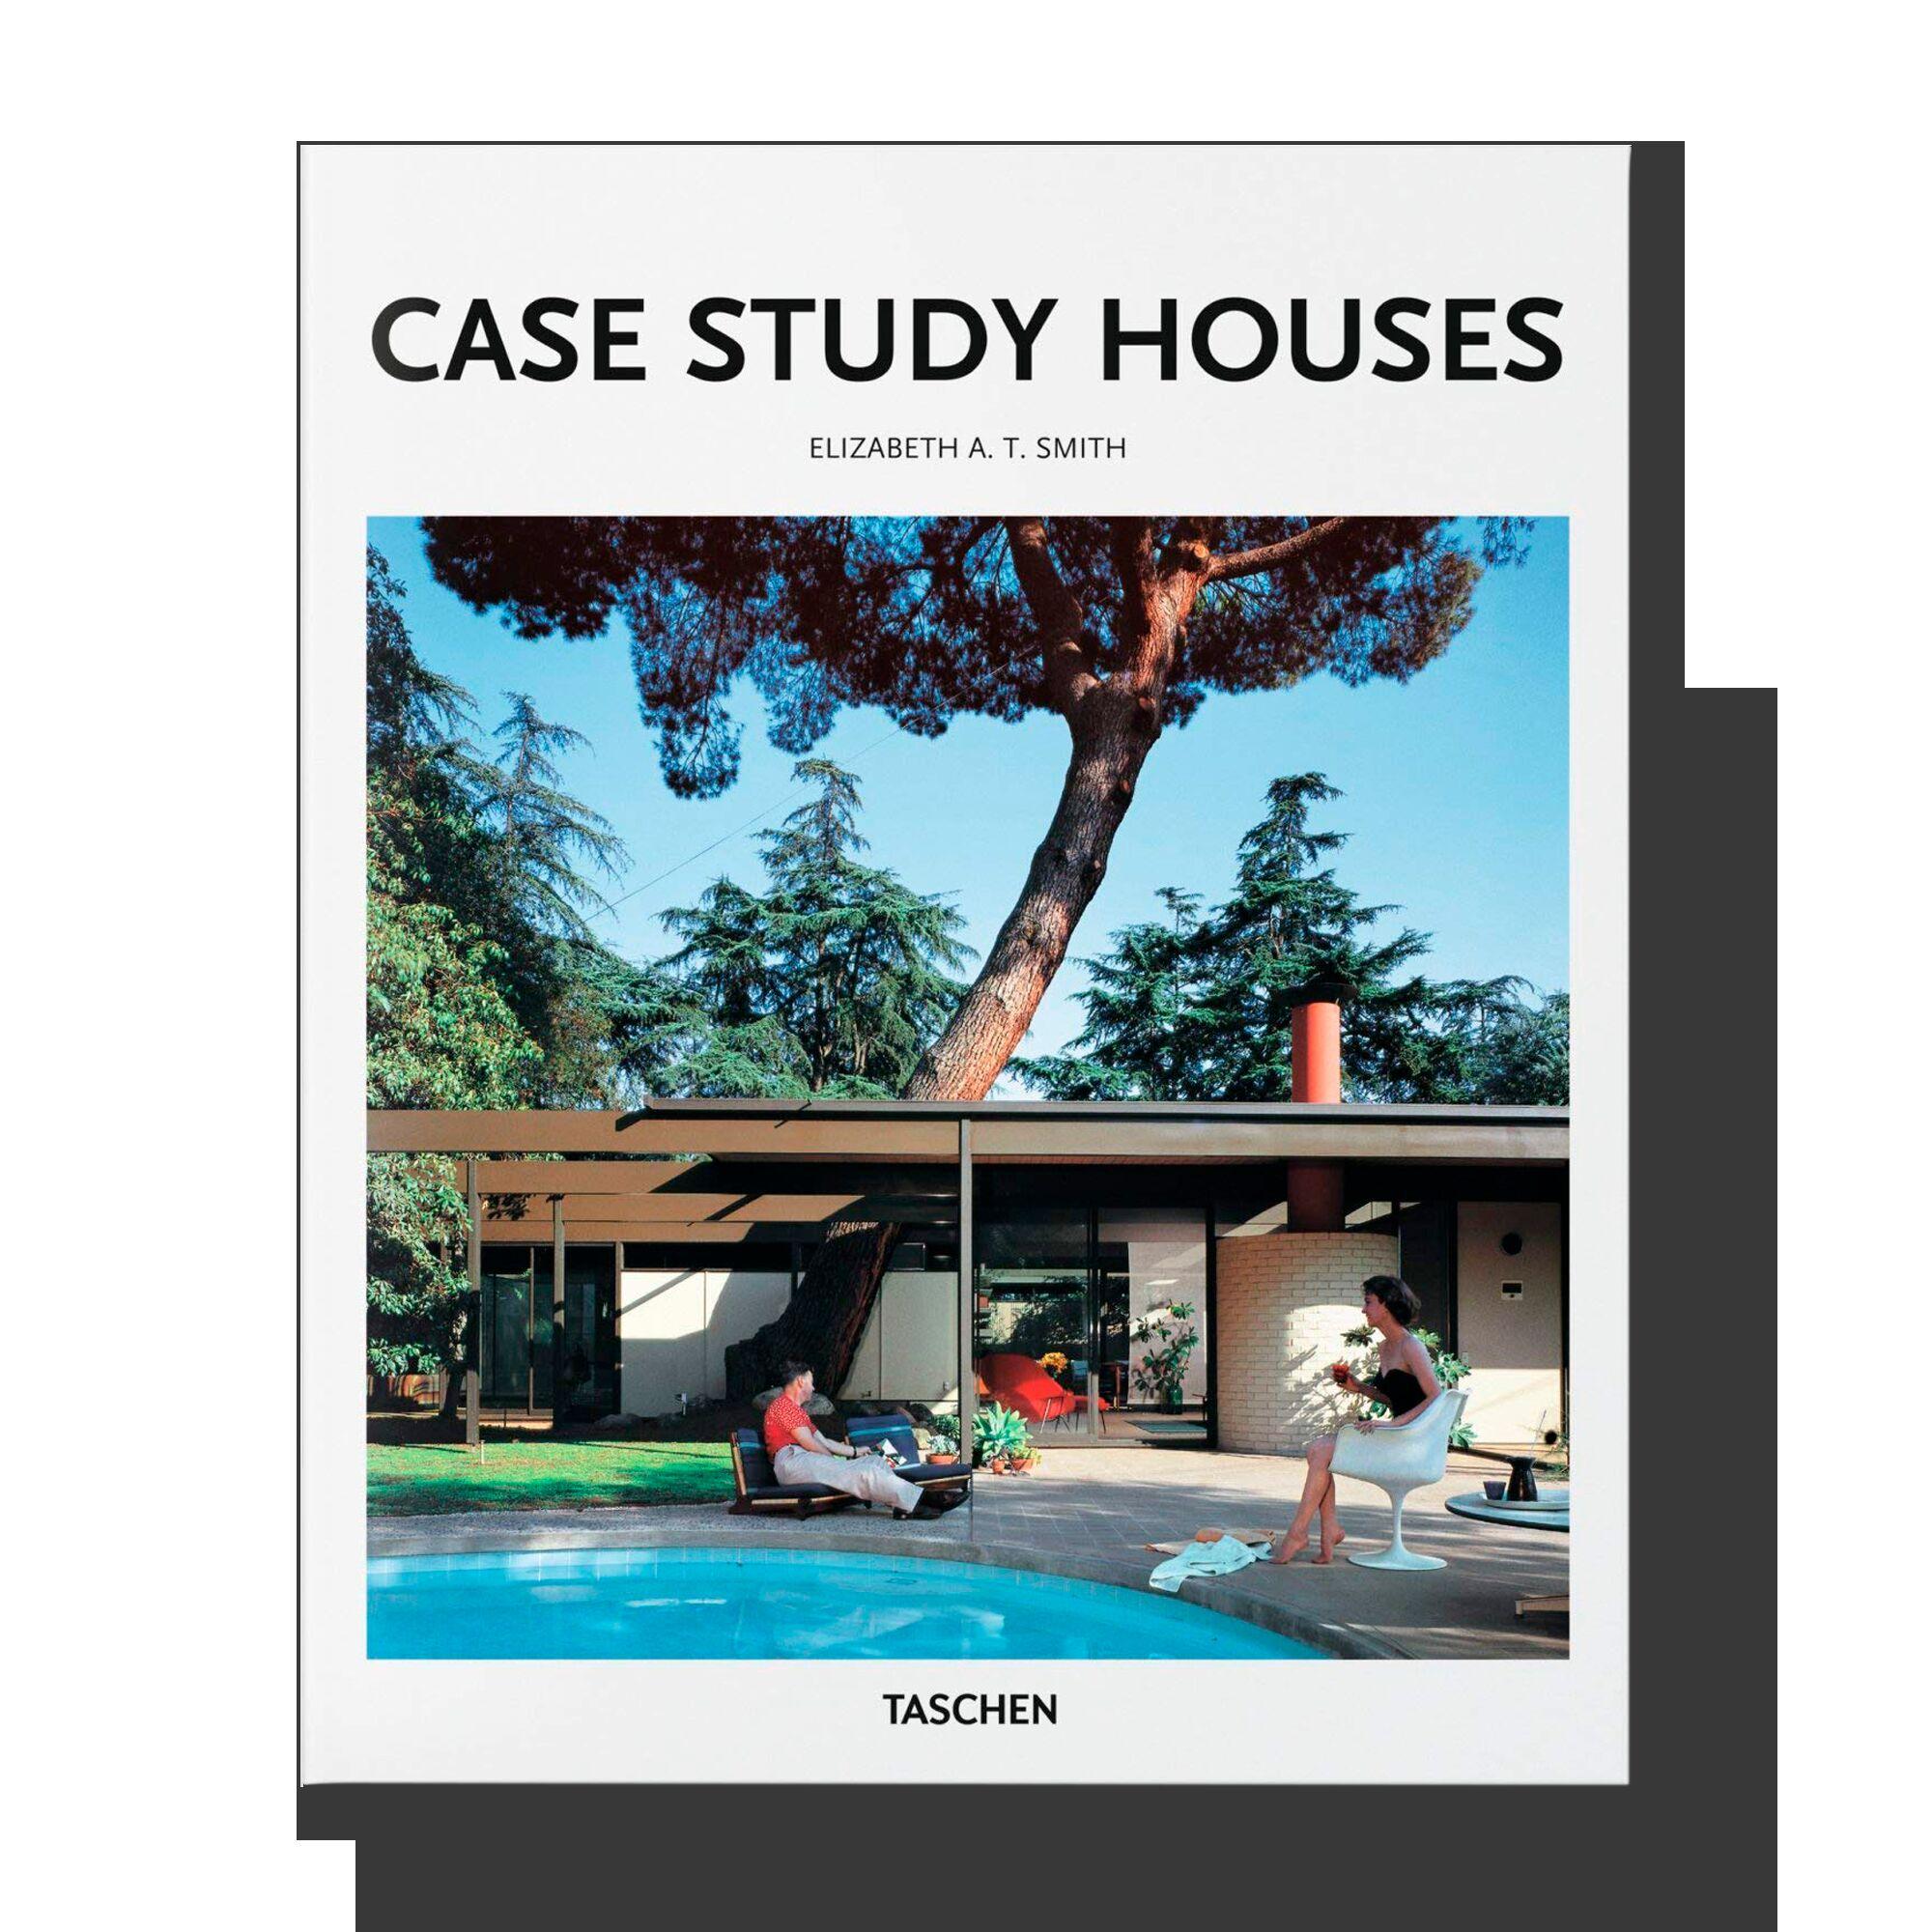 Case Study Houses (Basic Art Stusies)